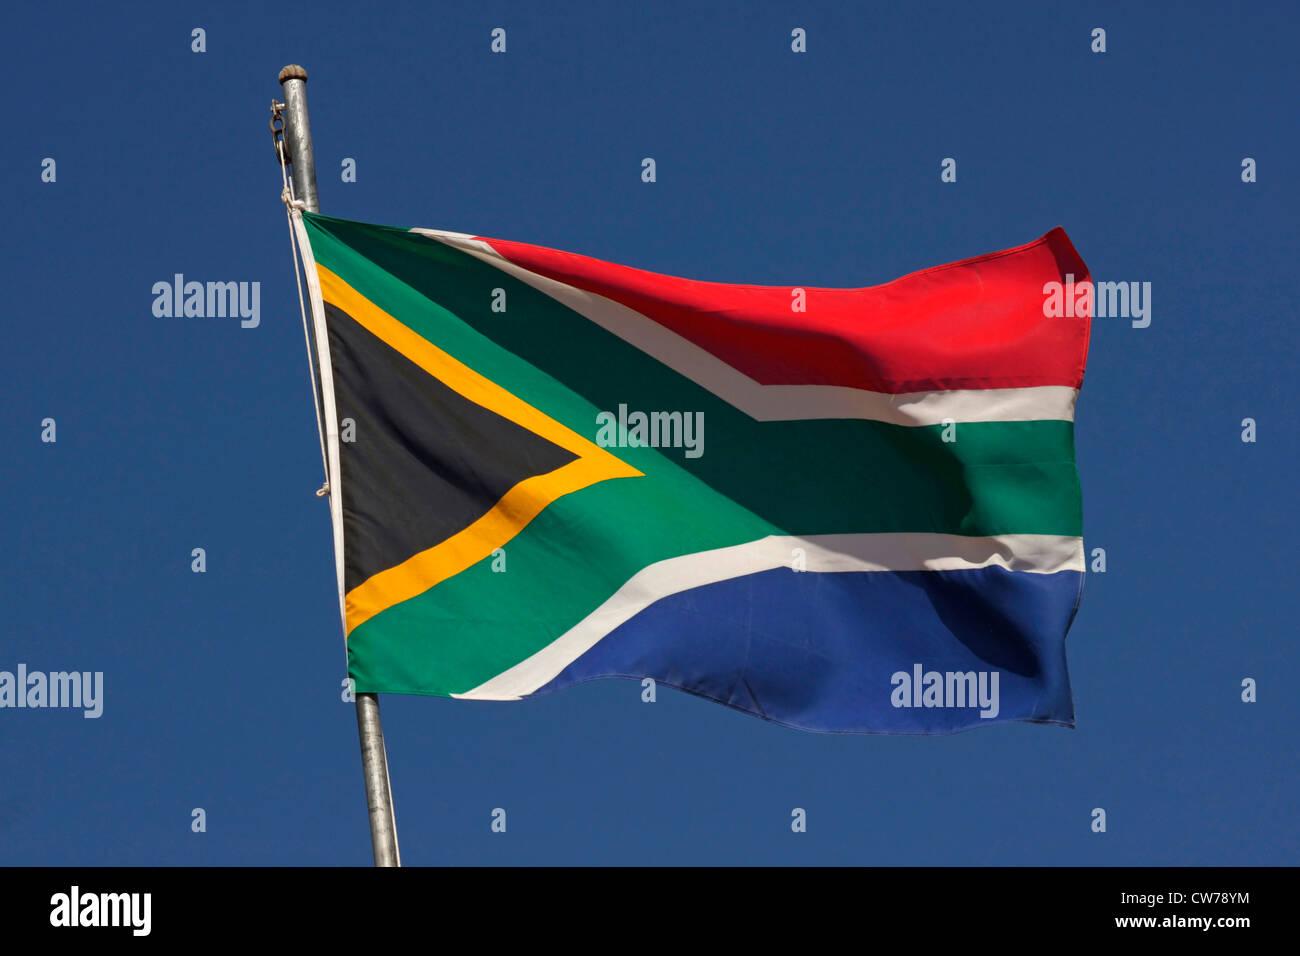 Sur bandera Afrikan aganst blue sky, Sudáfrica Foto de stock